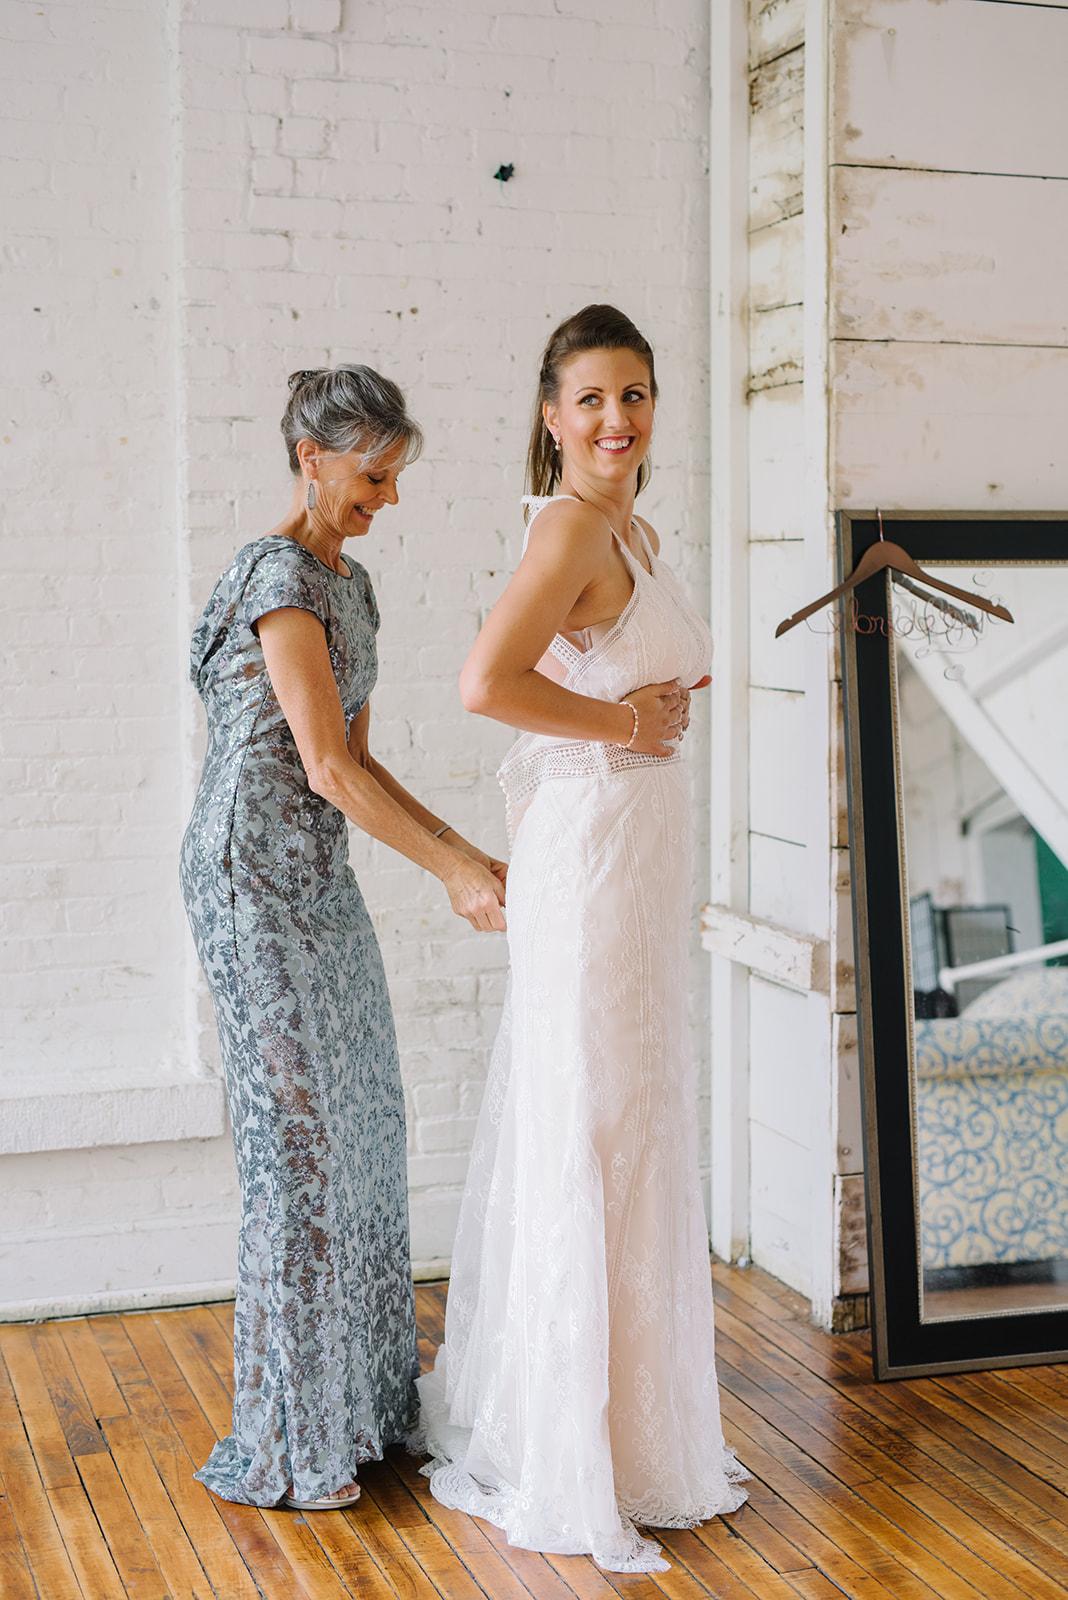 Art Factory Wedding- Industrial Chic- Audrey+Ryan- Paterson NJ- Olivia Christina Photo (14).jpg